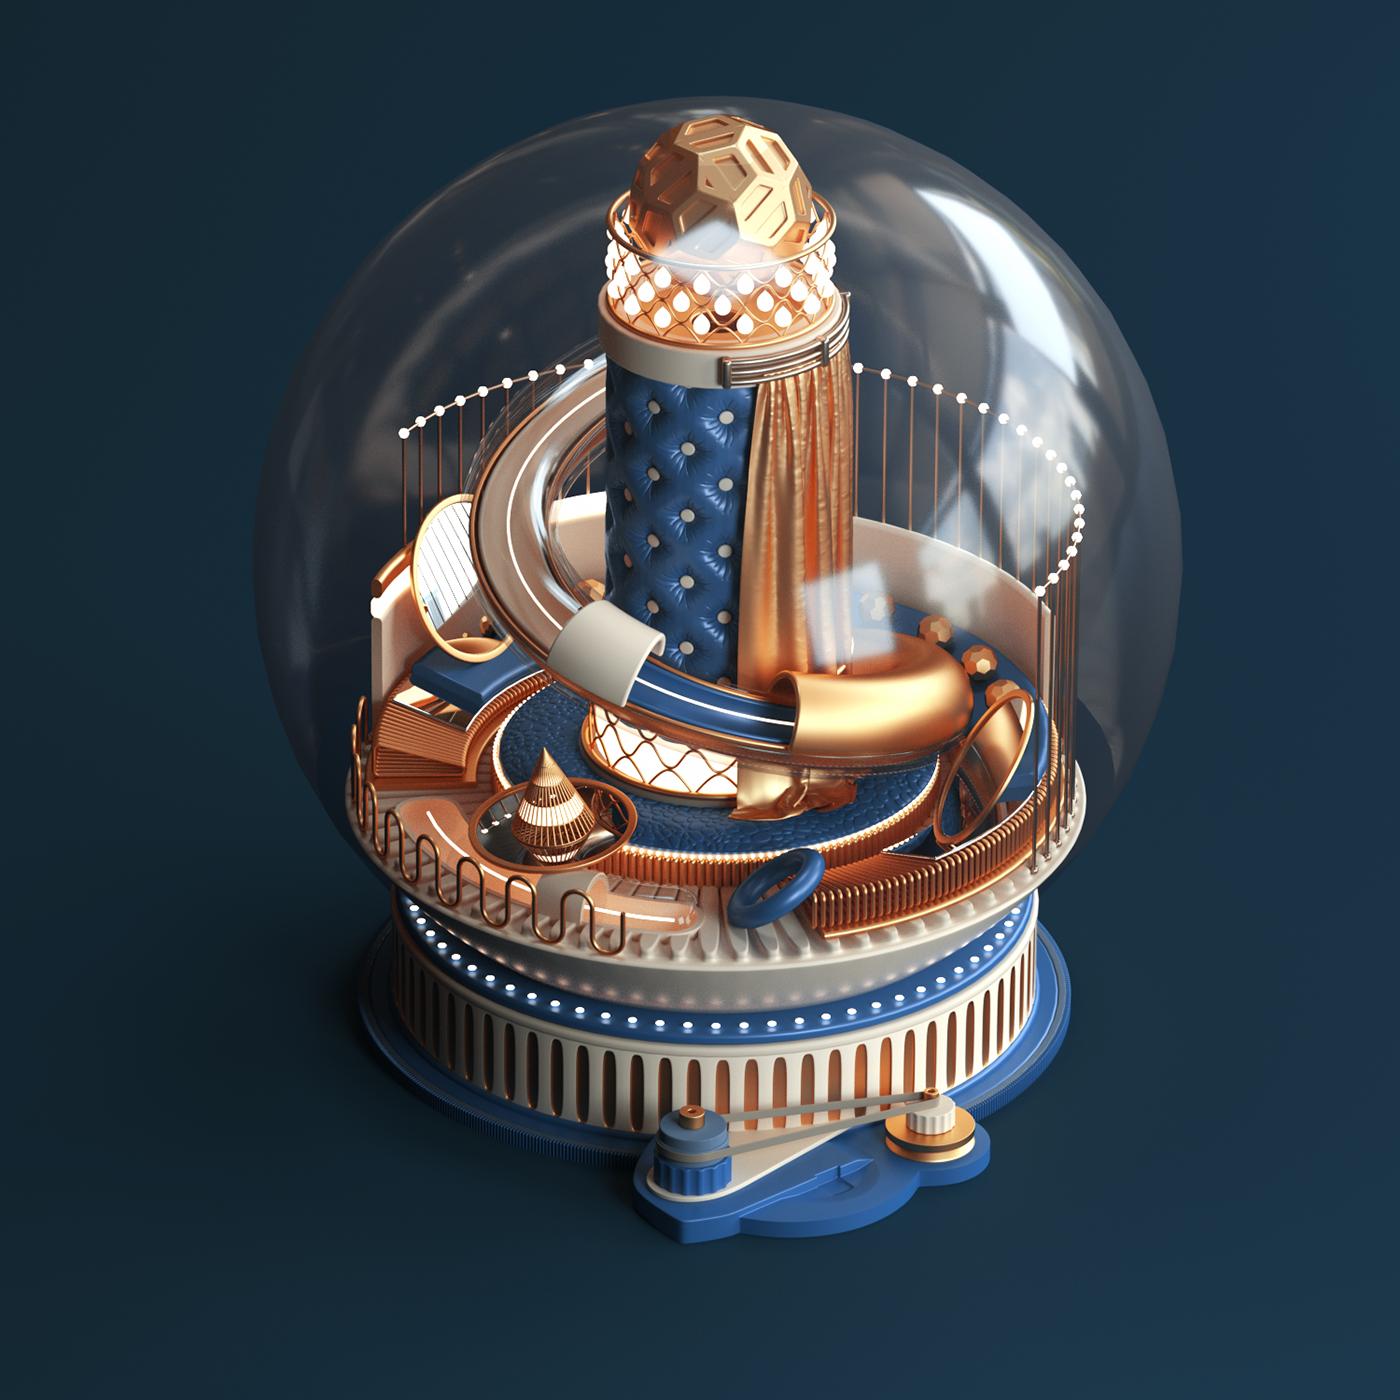 Fashion  xmas Christmas design snowball JVG Tarka 3D CGI krol